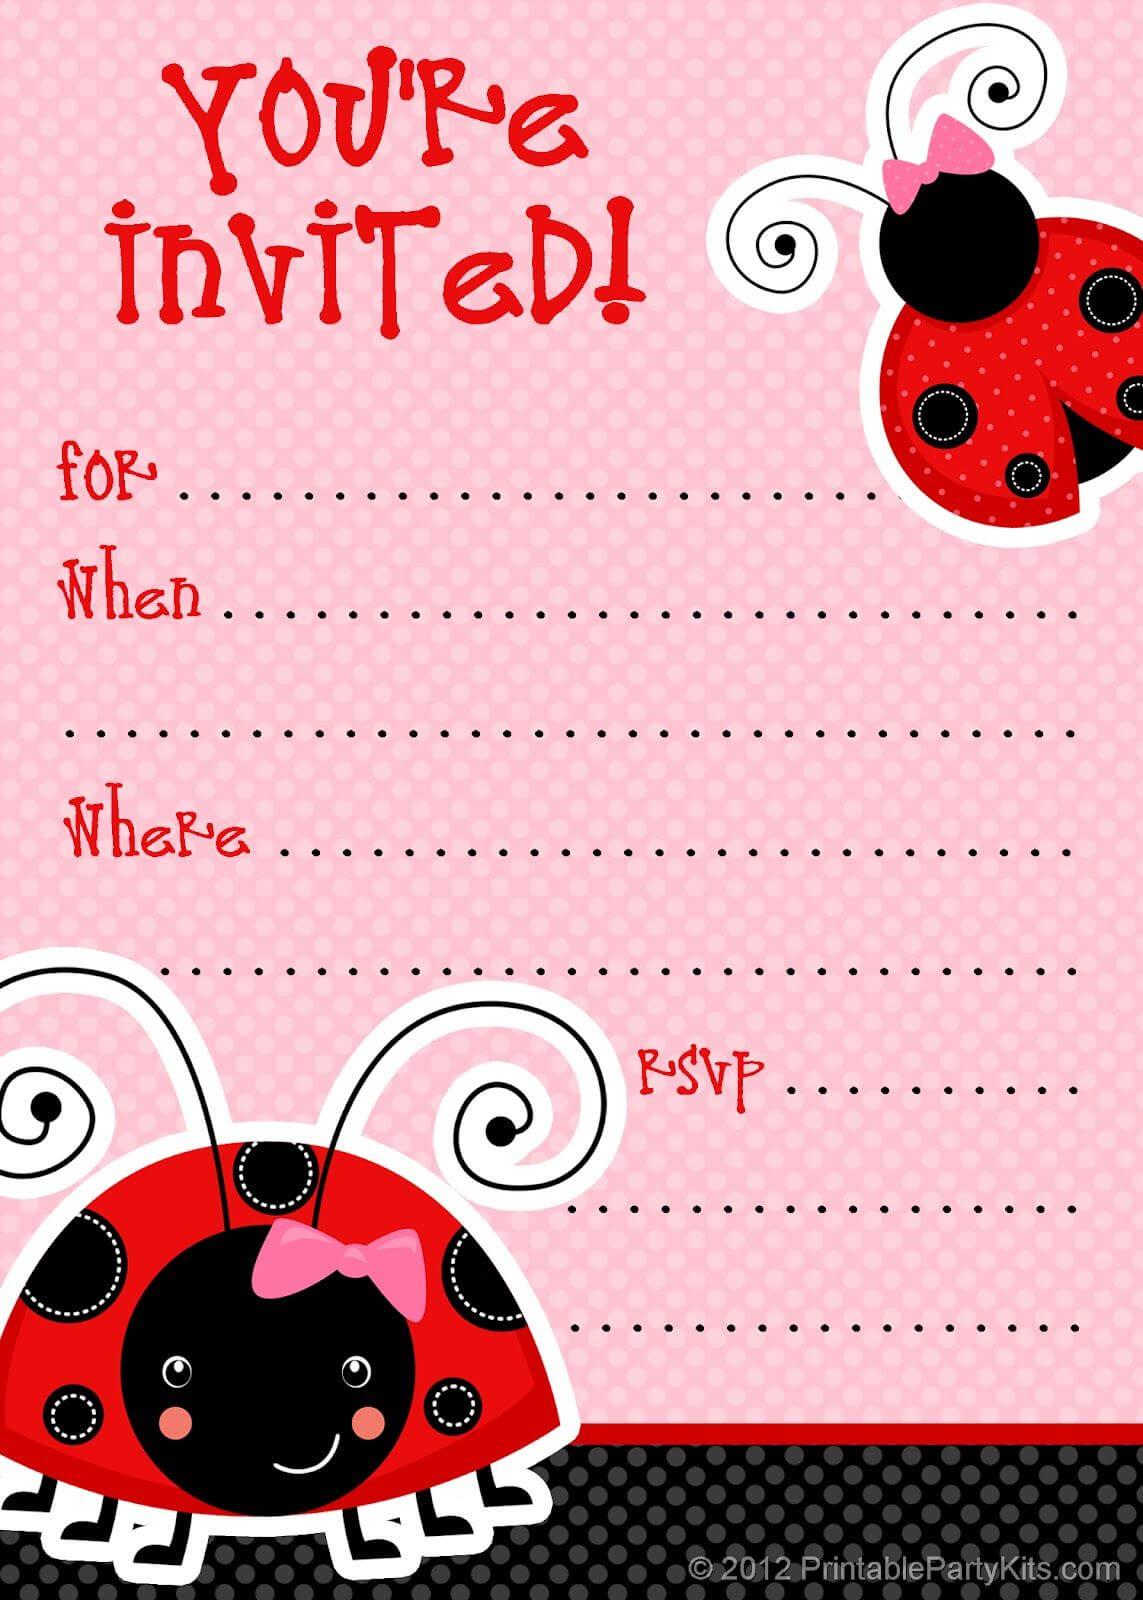 1) Free Printable Ladybug Invitation Blank Template. 2 For Blank Ladybug Template